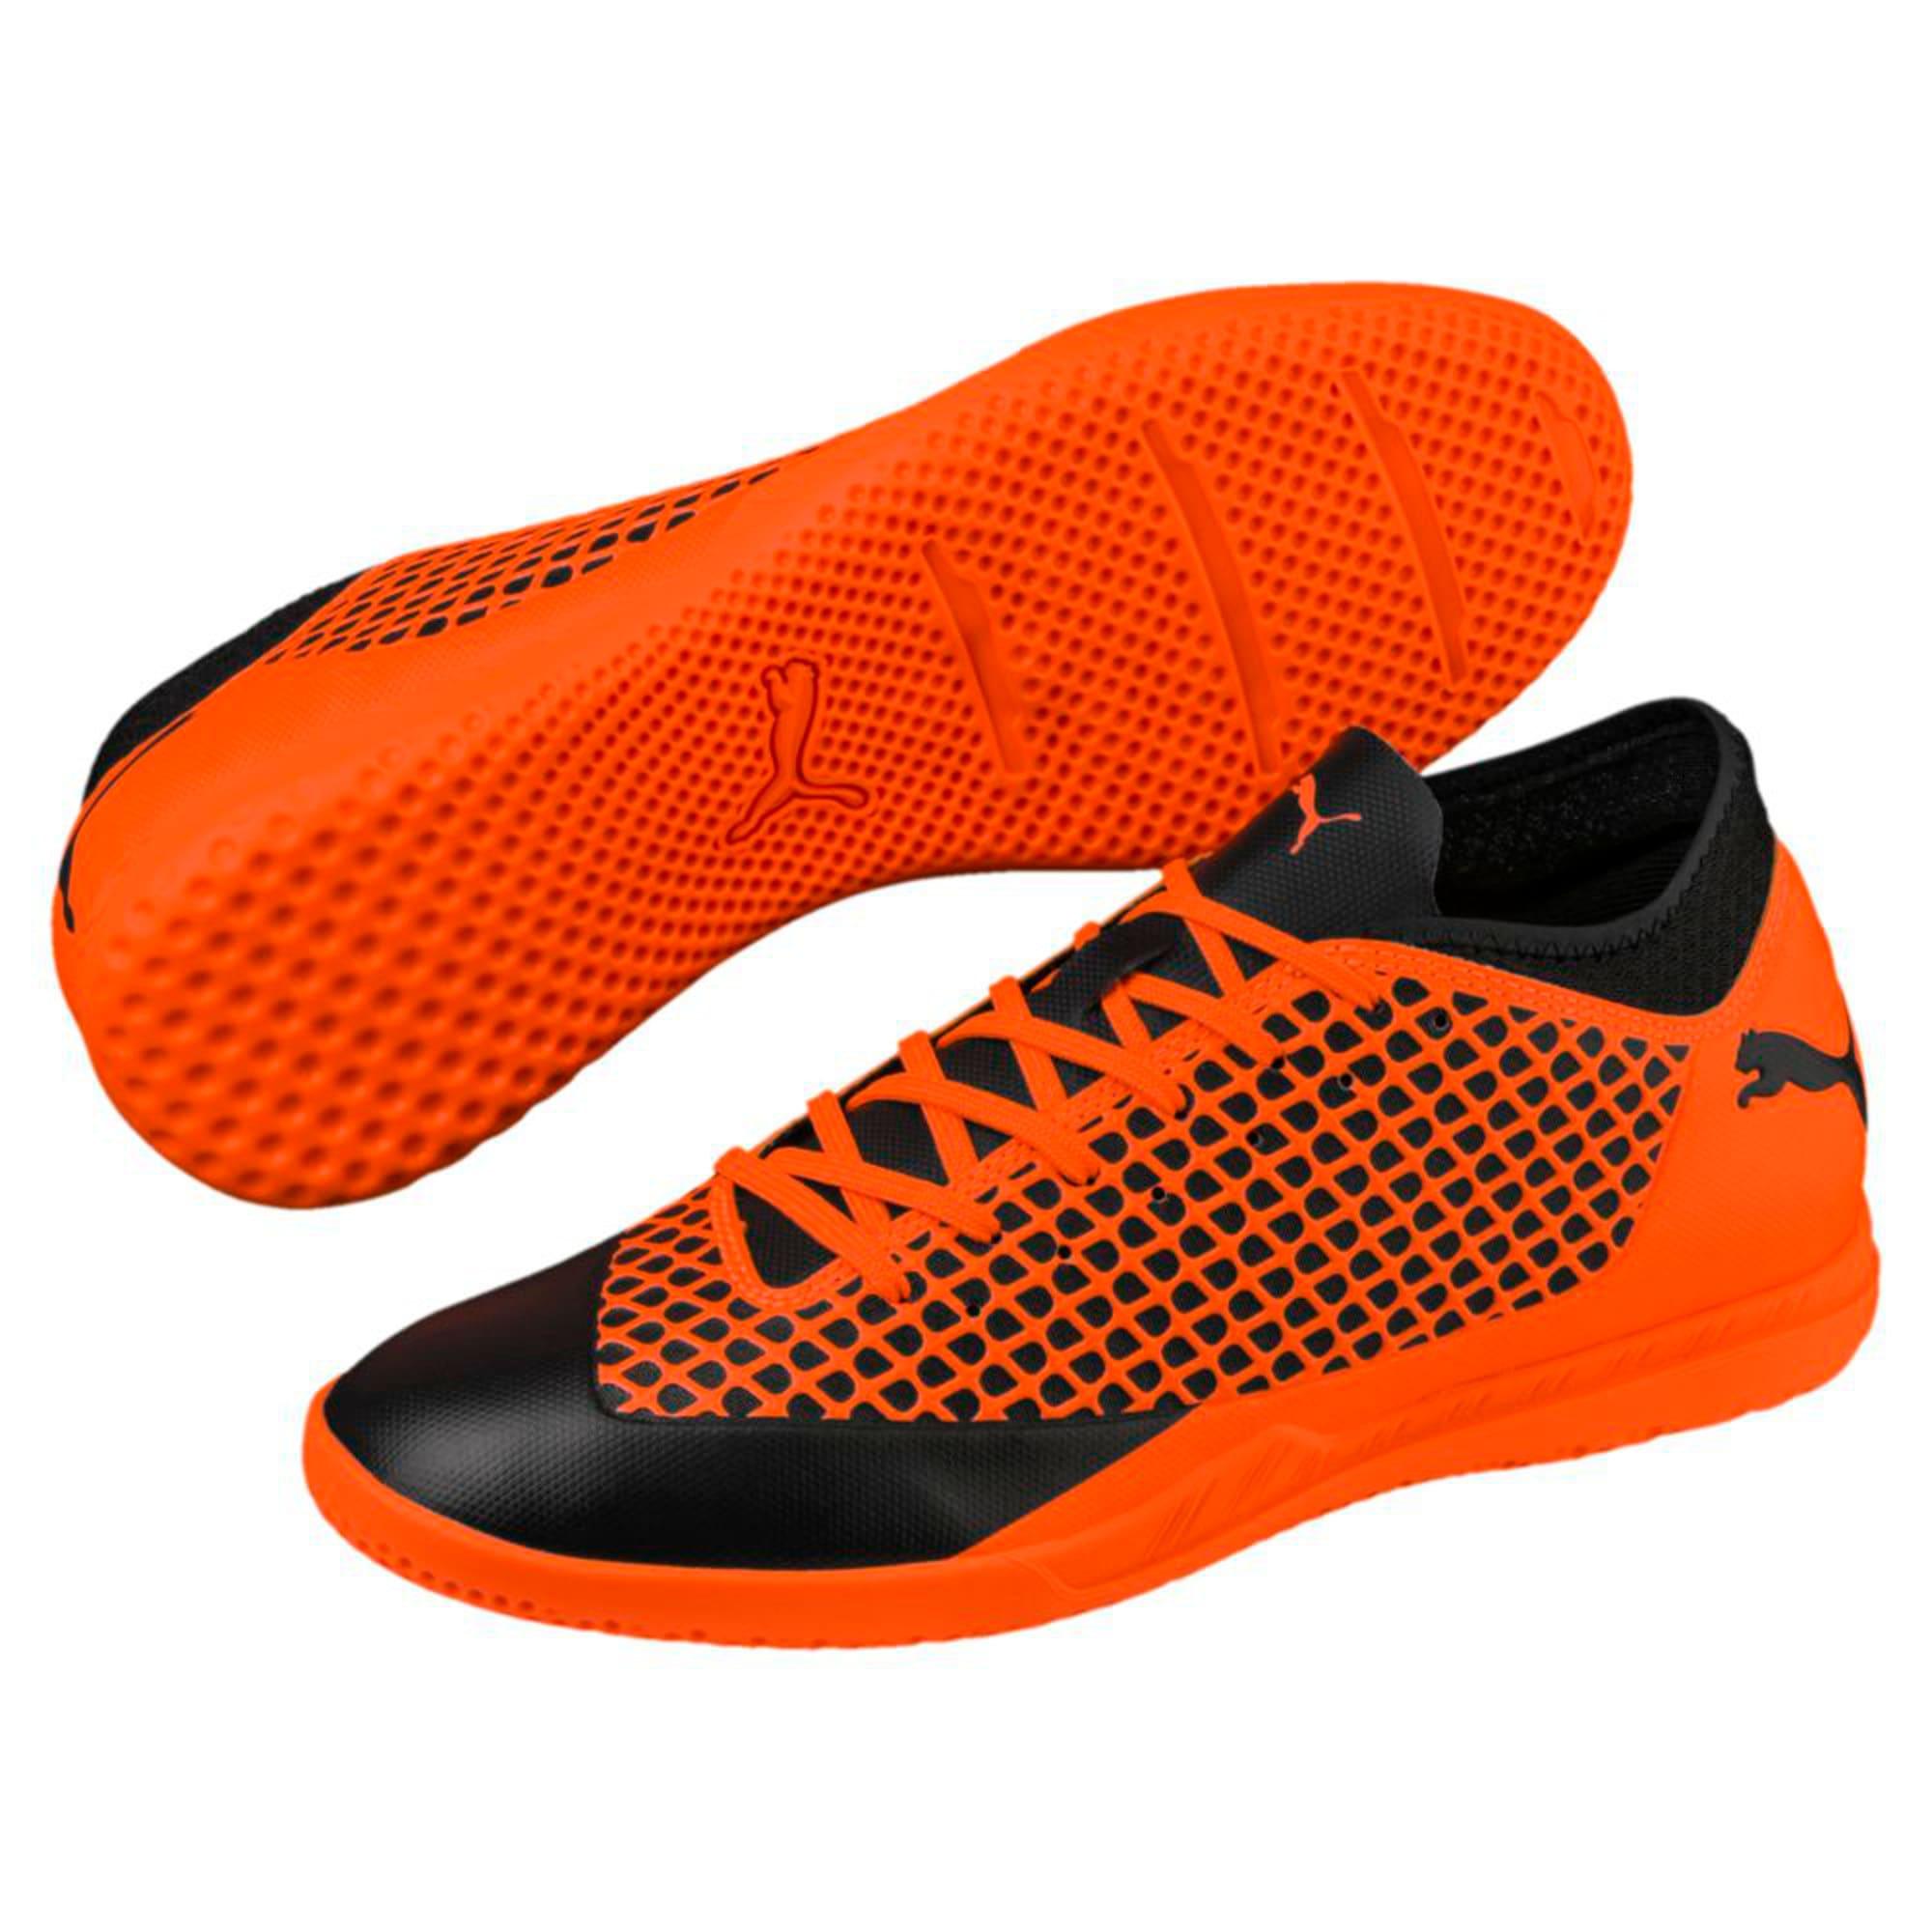 Thumbnail 6 of FUTURE 2.4 IT  Football Shoes, Black-Orange, medium-IND